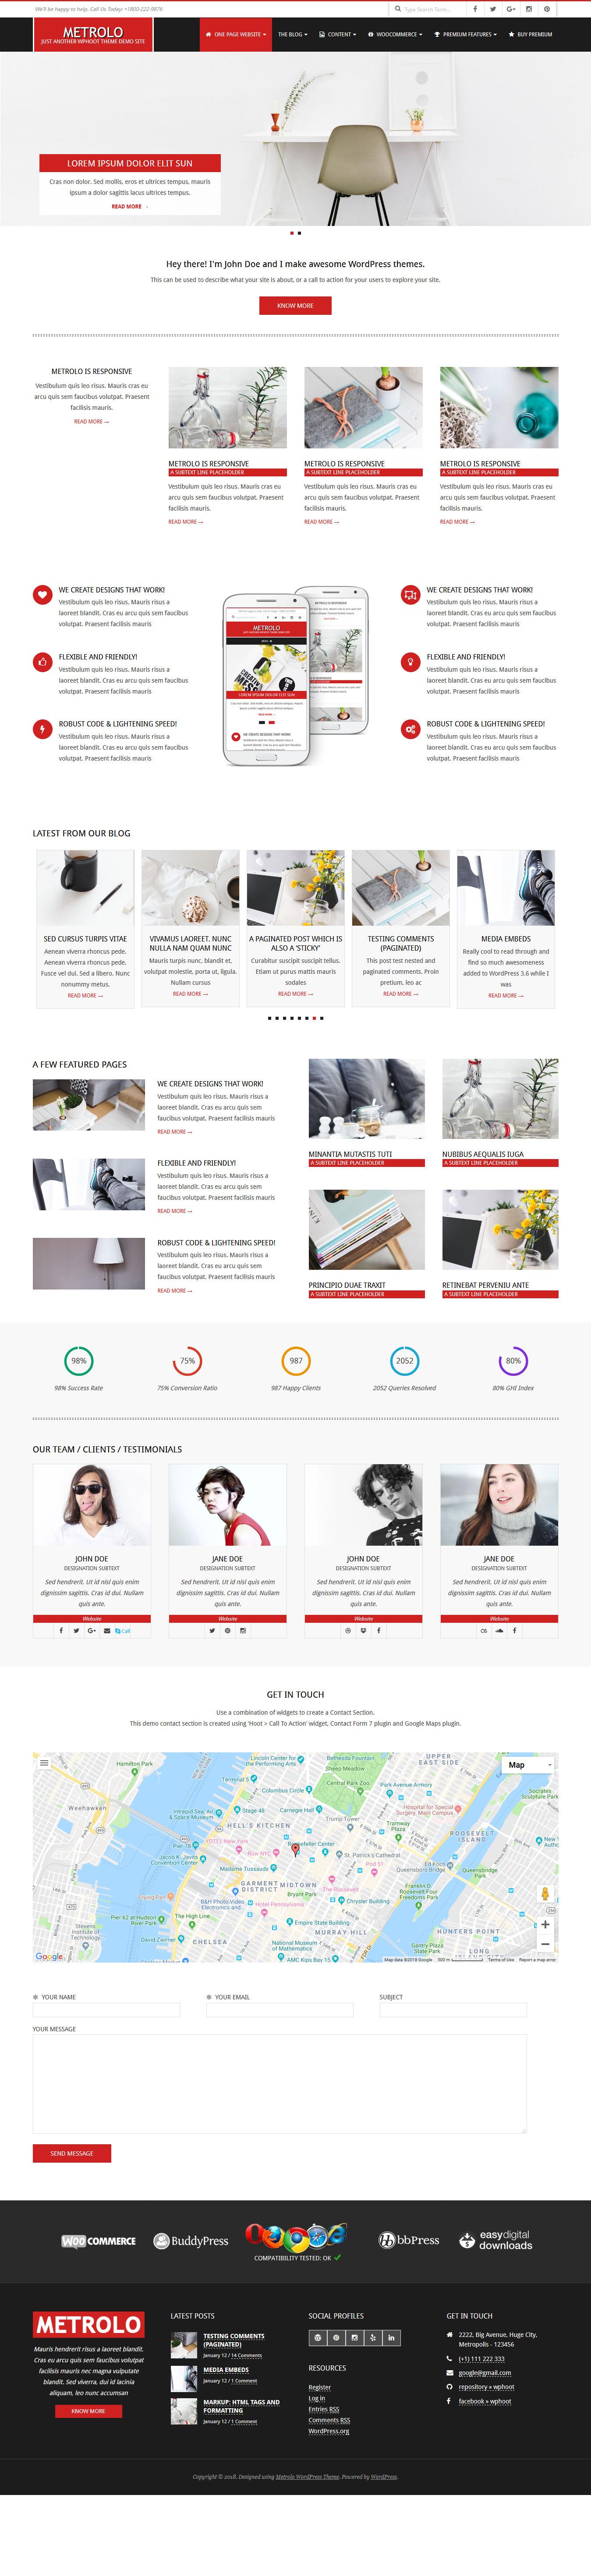 Metrolo - Best Free Event WordPress Theme